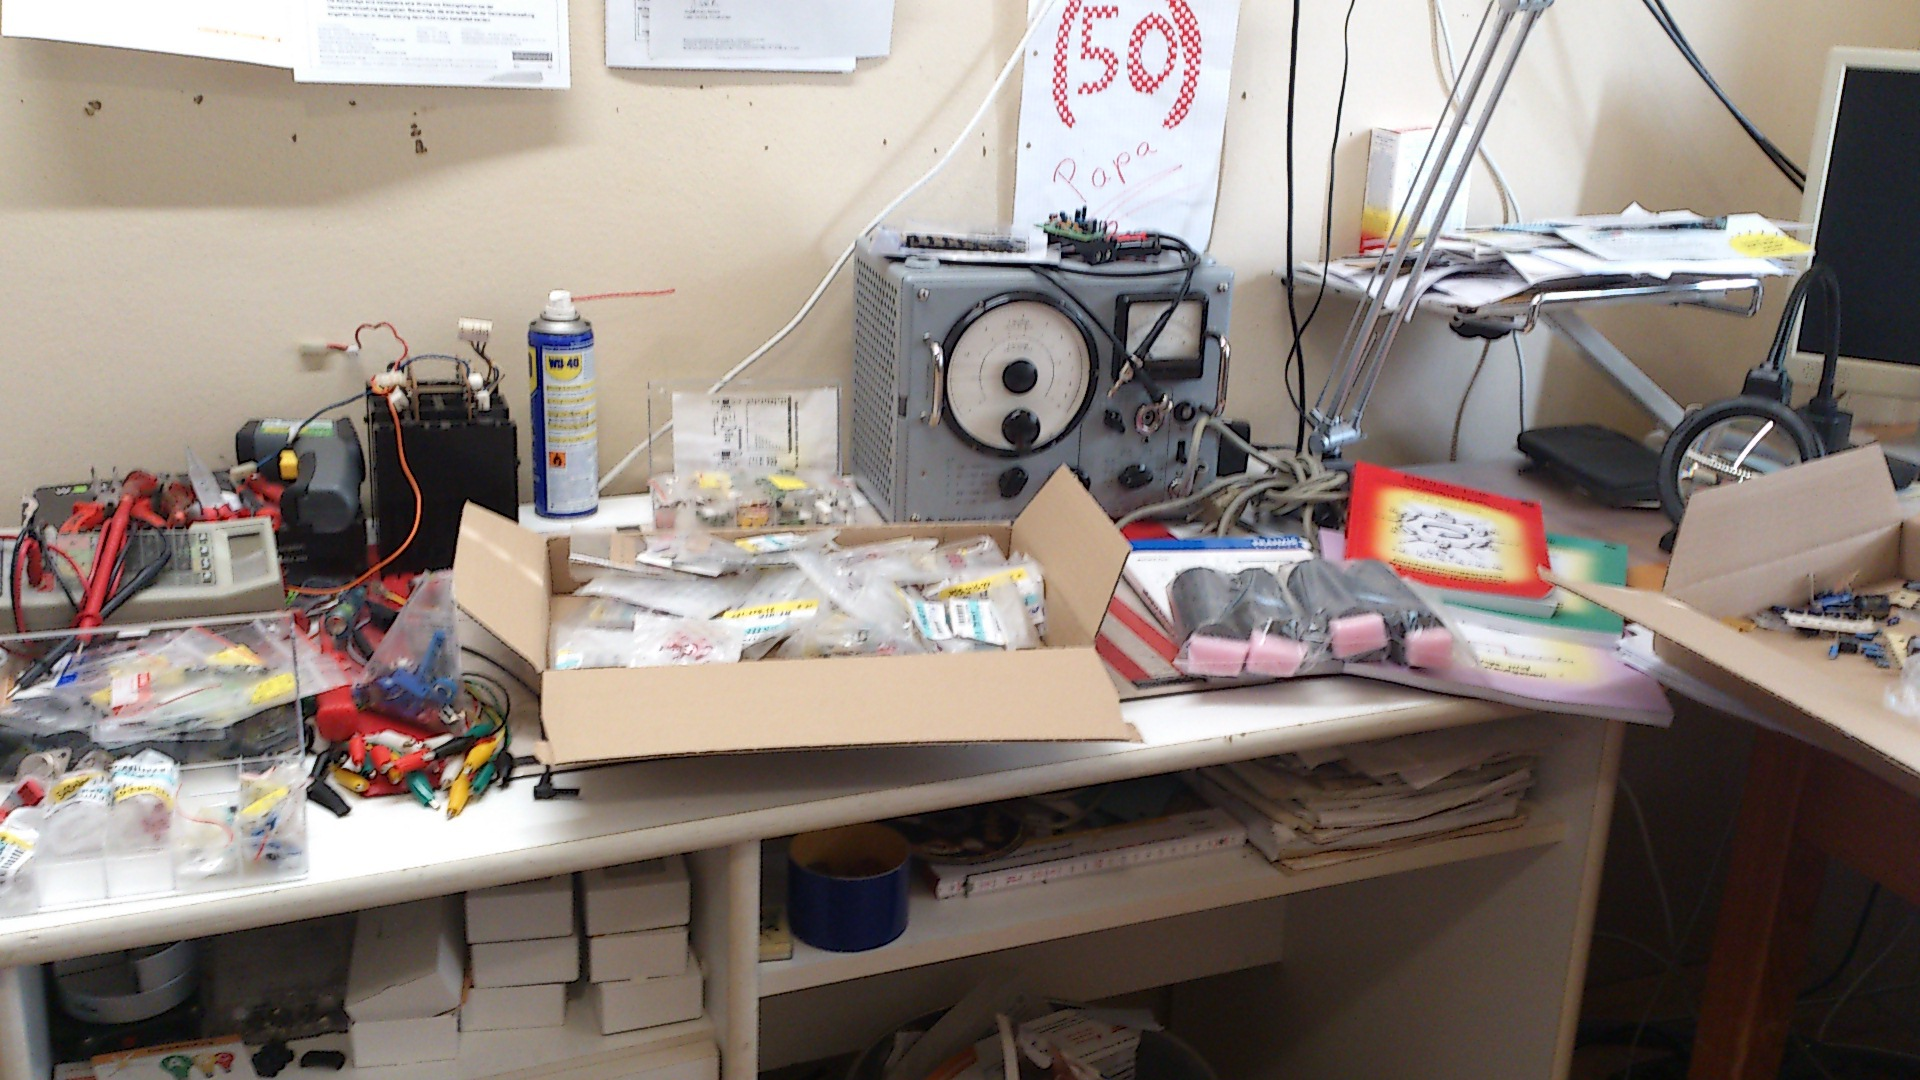 Schreibtisch chaos for Schreibtisch chaos